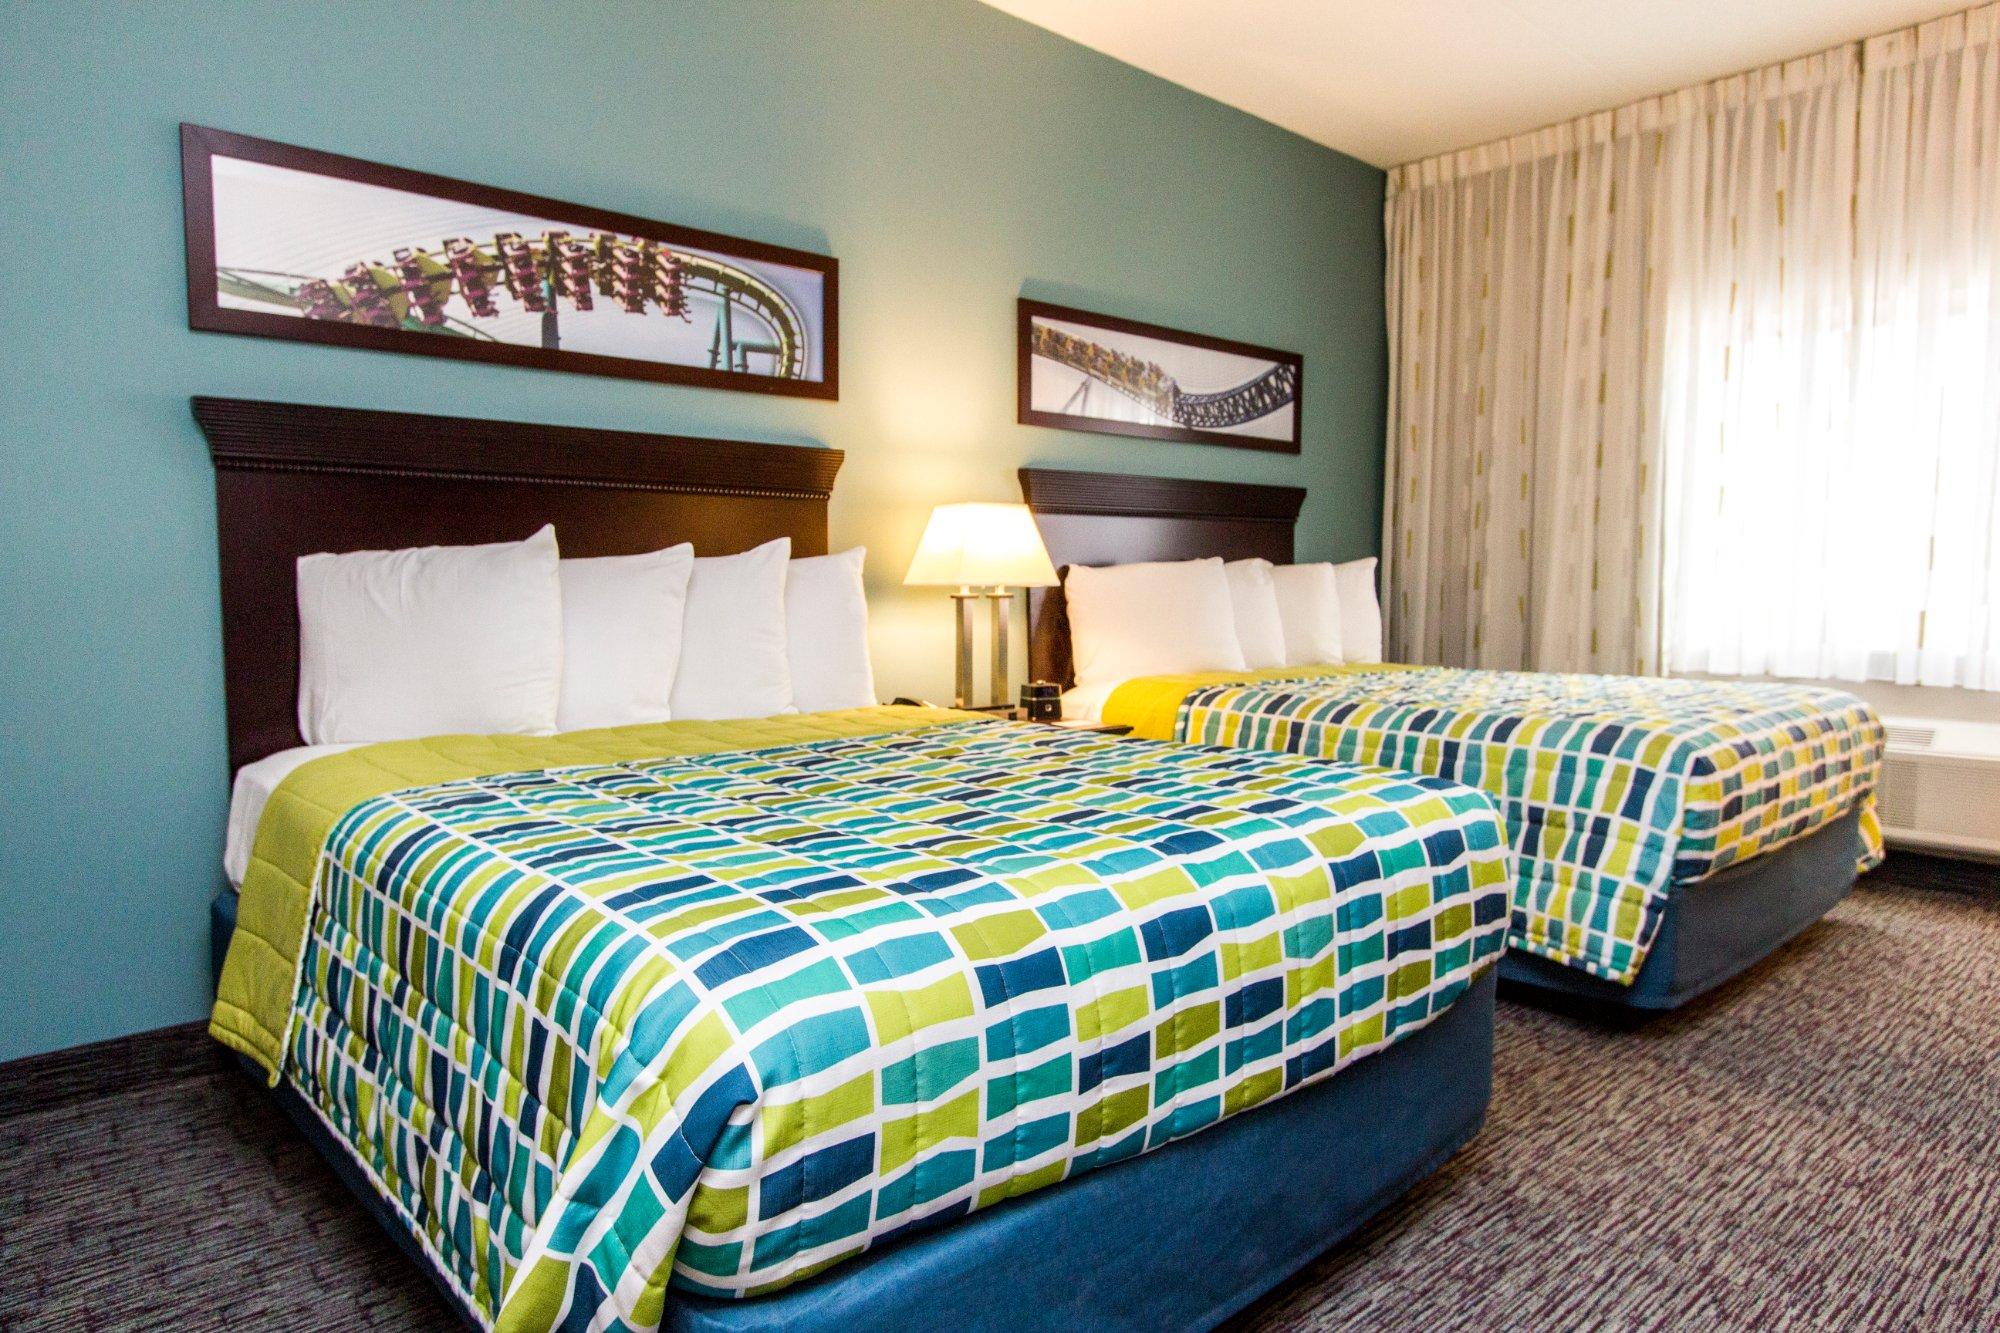 Cedar Point's Express Hotel